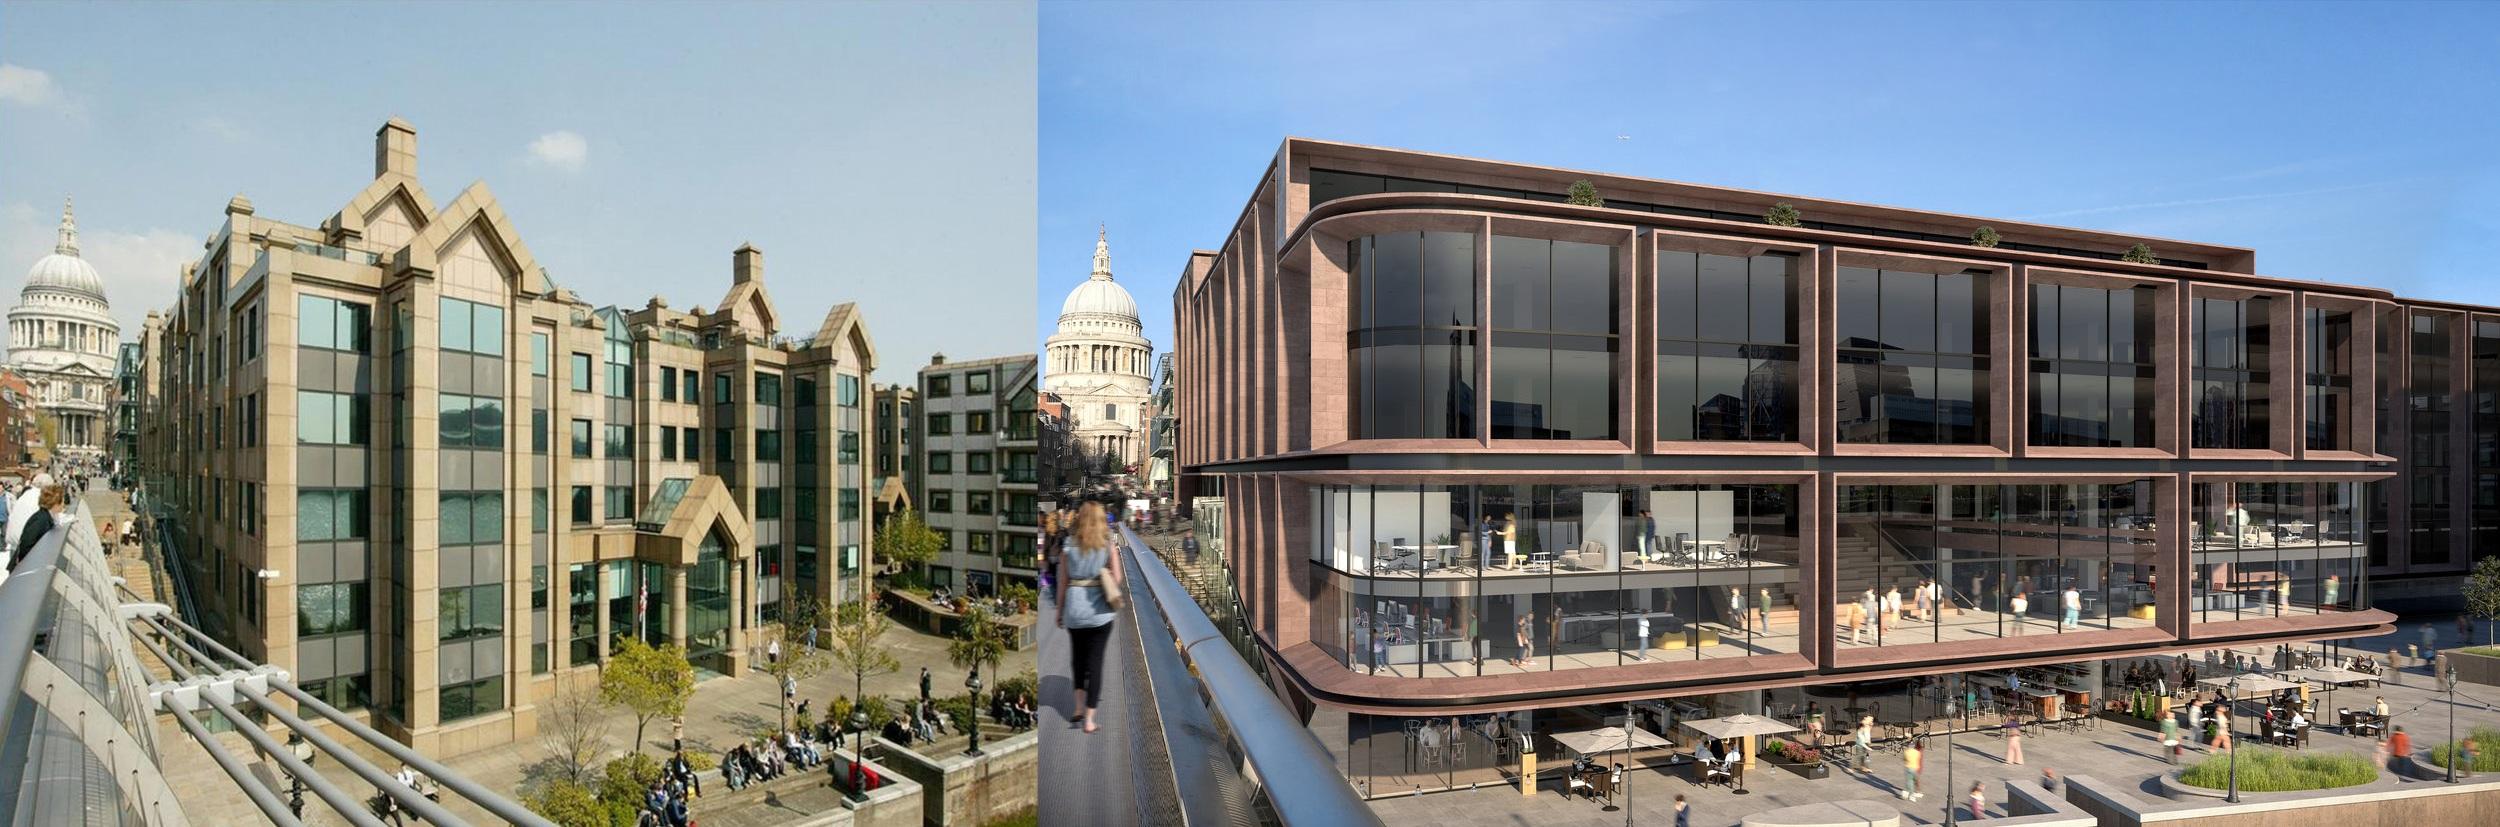 Revitalized Public Realm - View from the Millennium Bridge